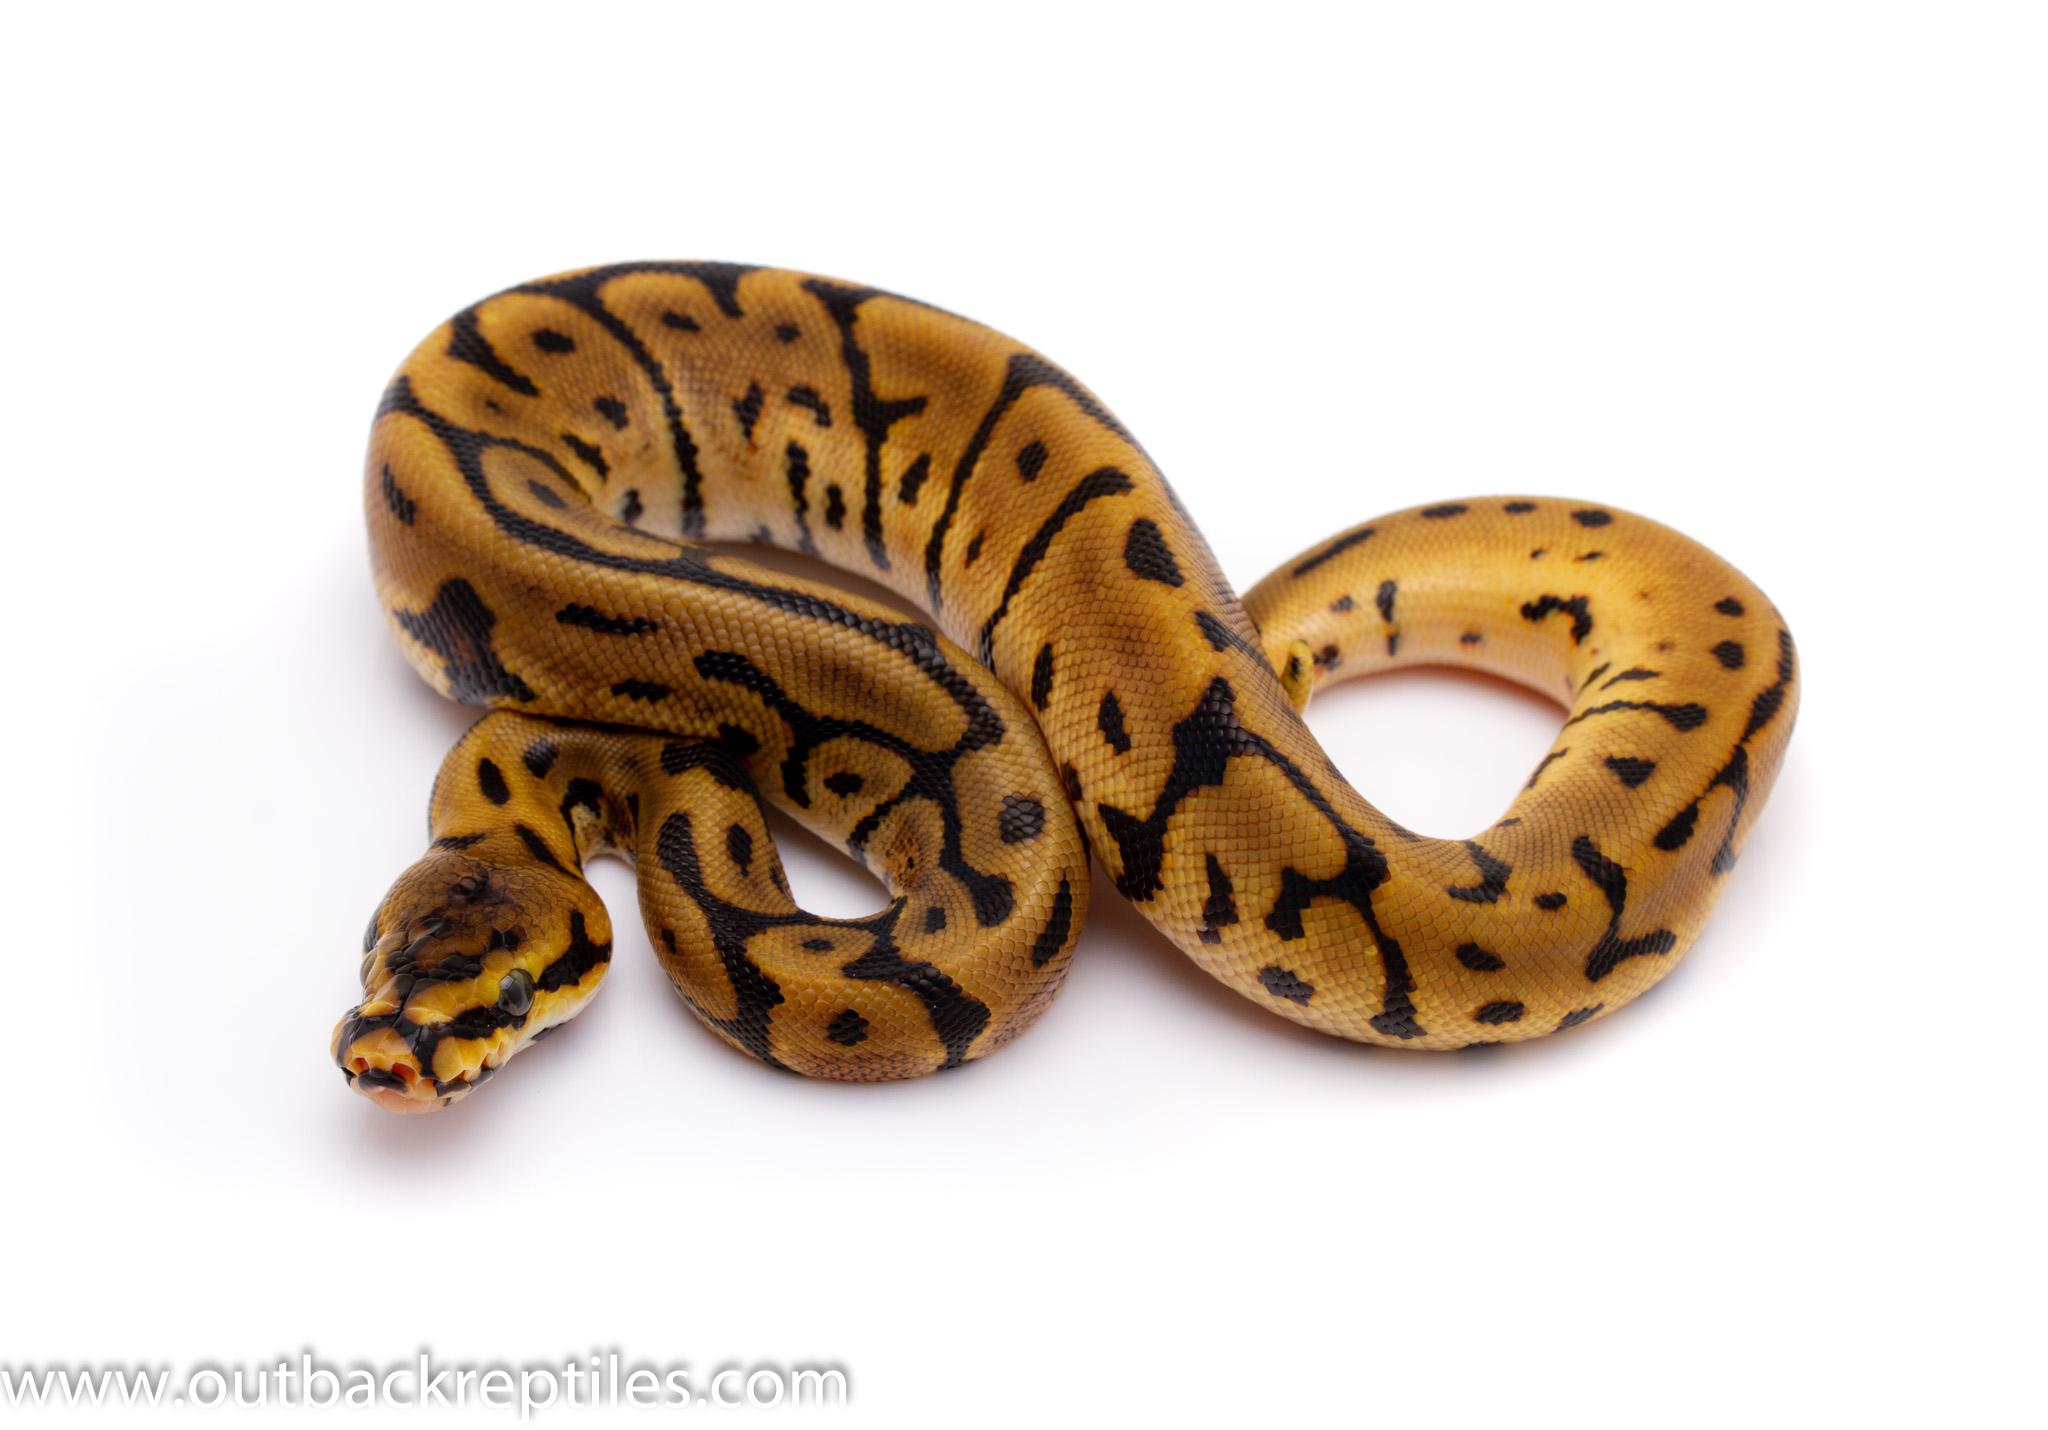 leopard spider het pied ball python for sale